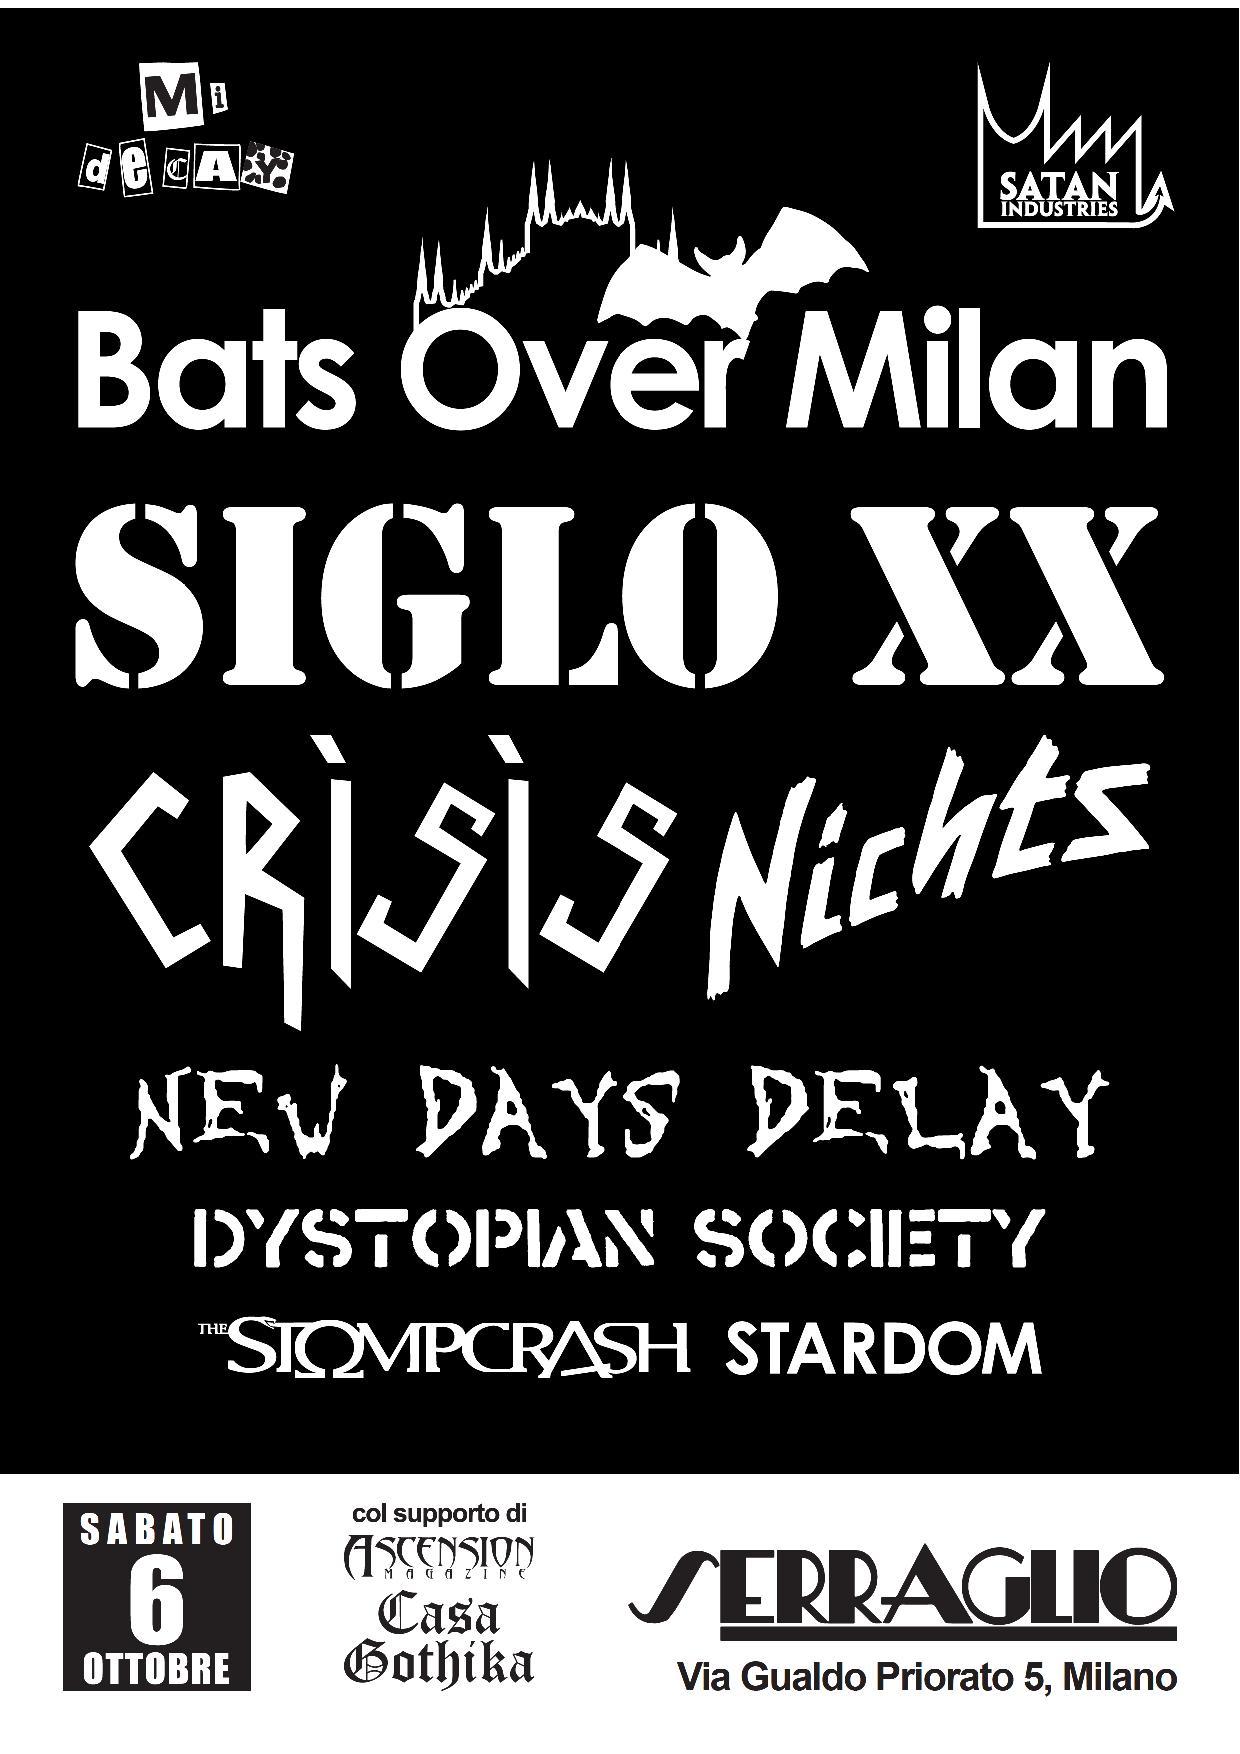 BATS OVER MILAN FESTIVAL